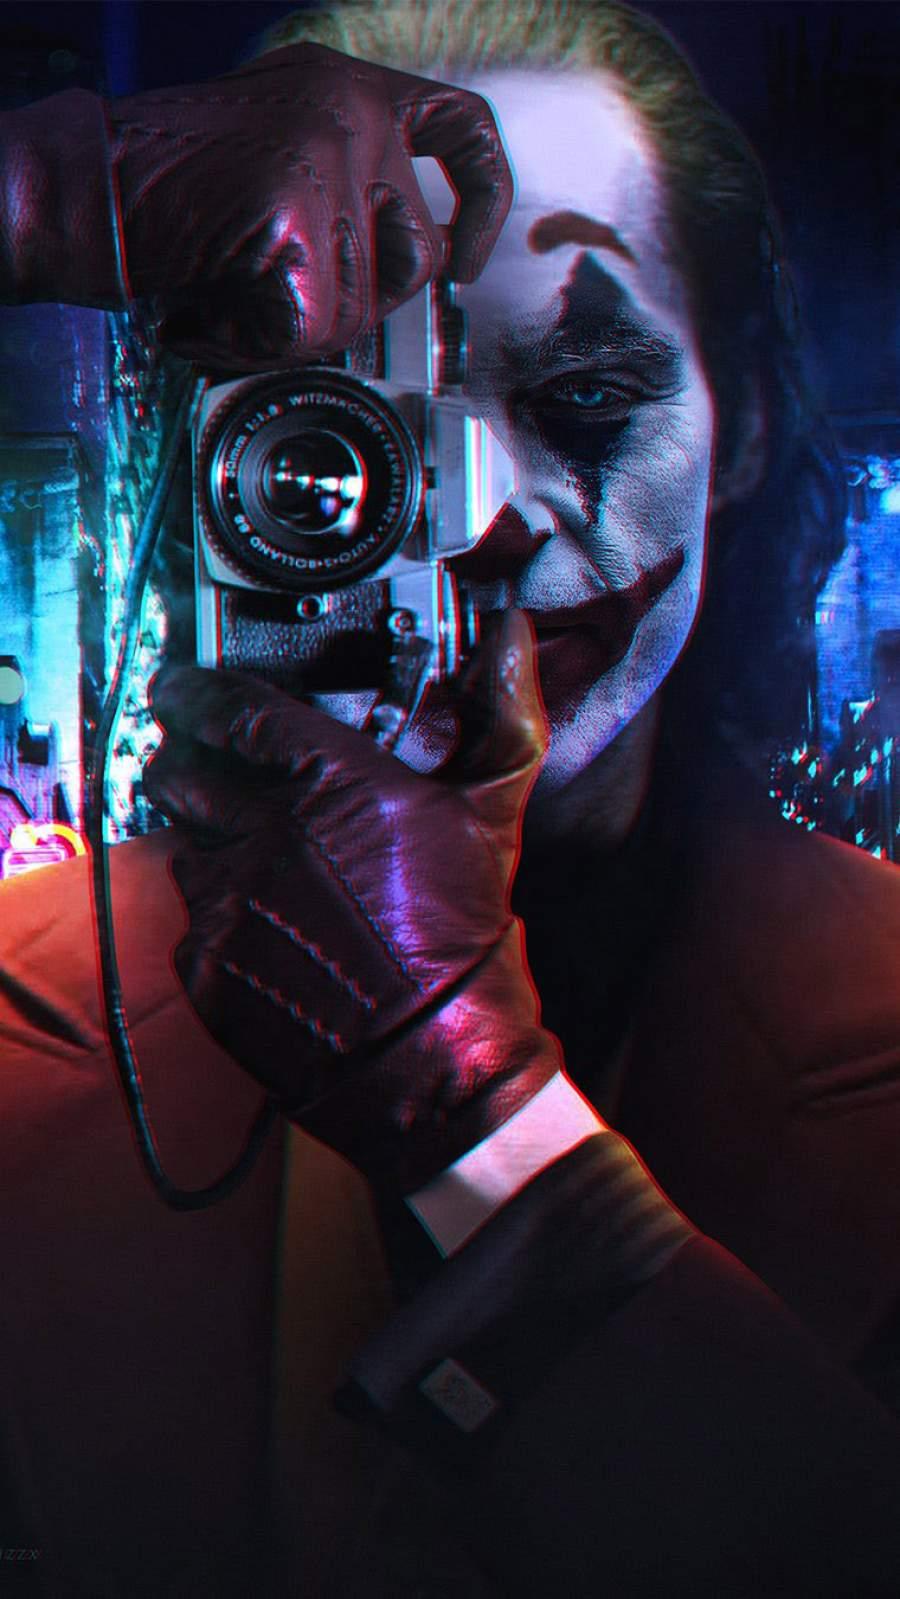 Joker Photography iPhone Wallpaper